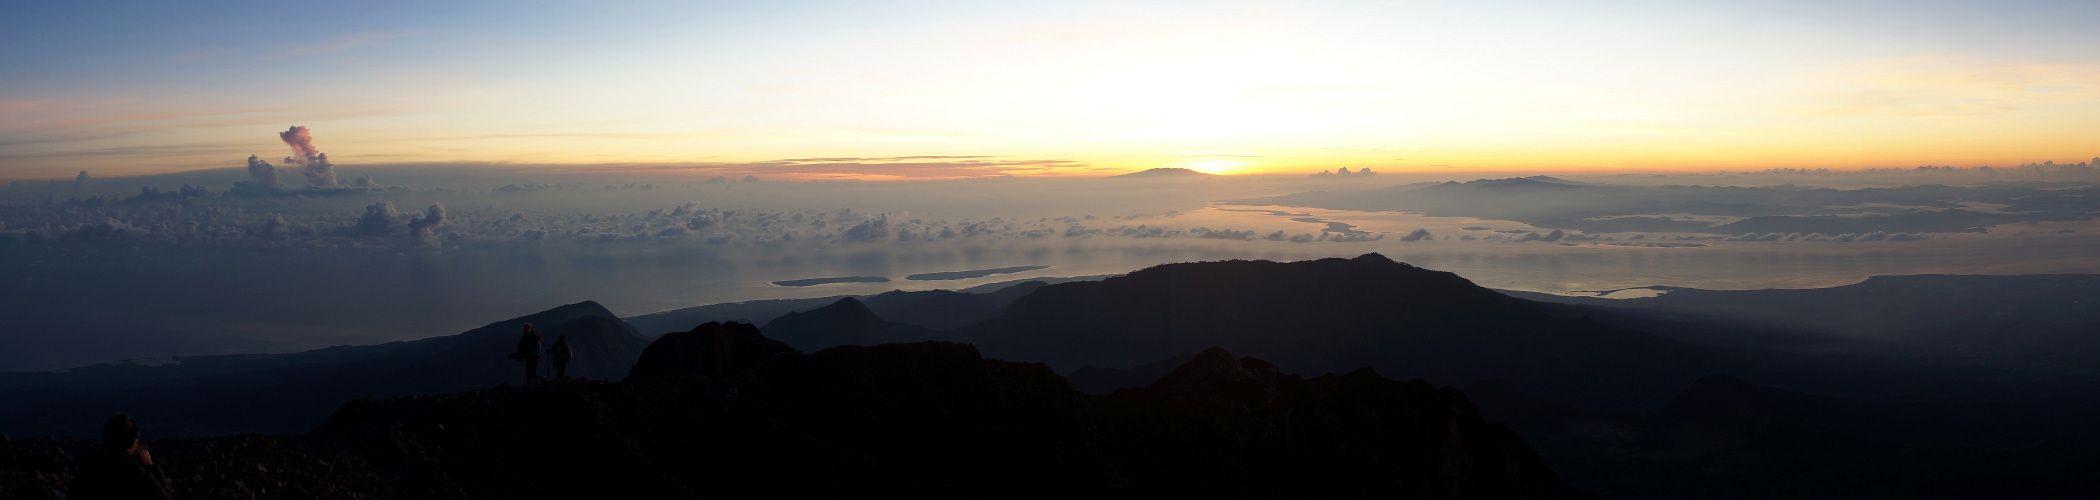 sunrise from the top of Rinjani volcano